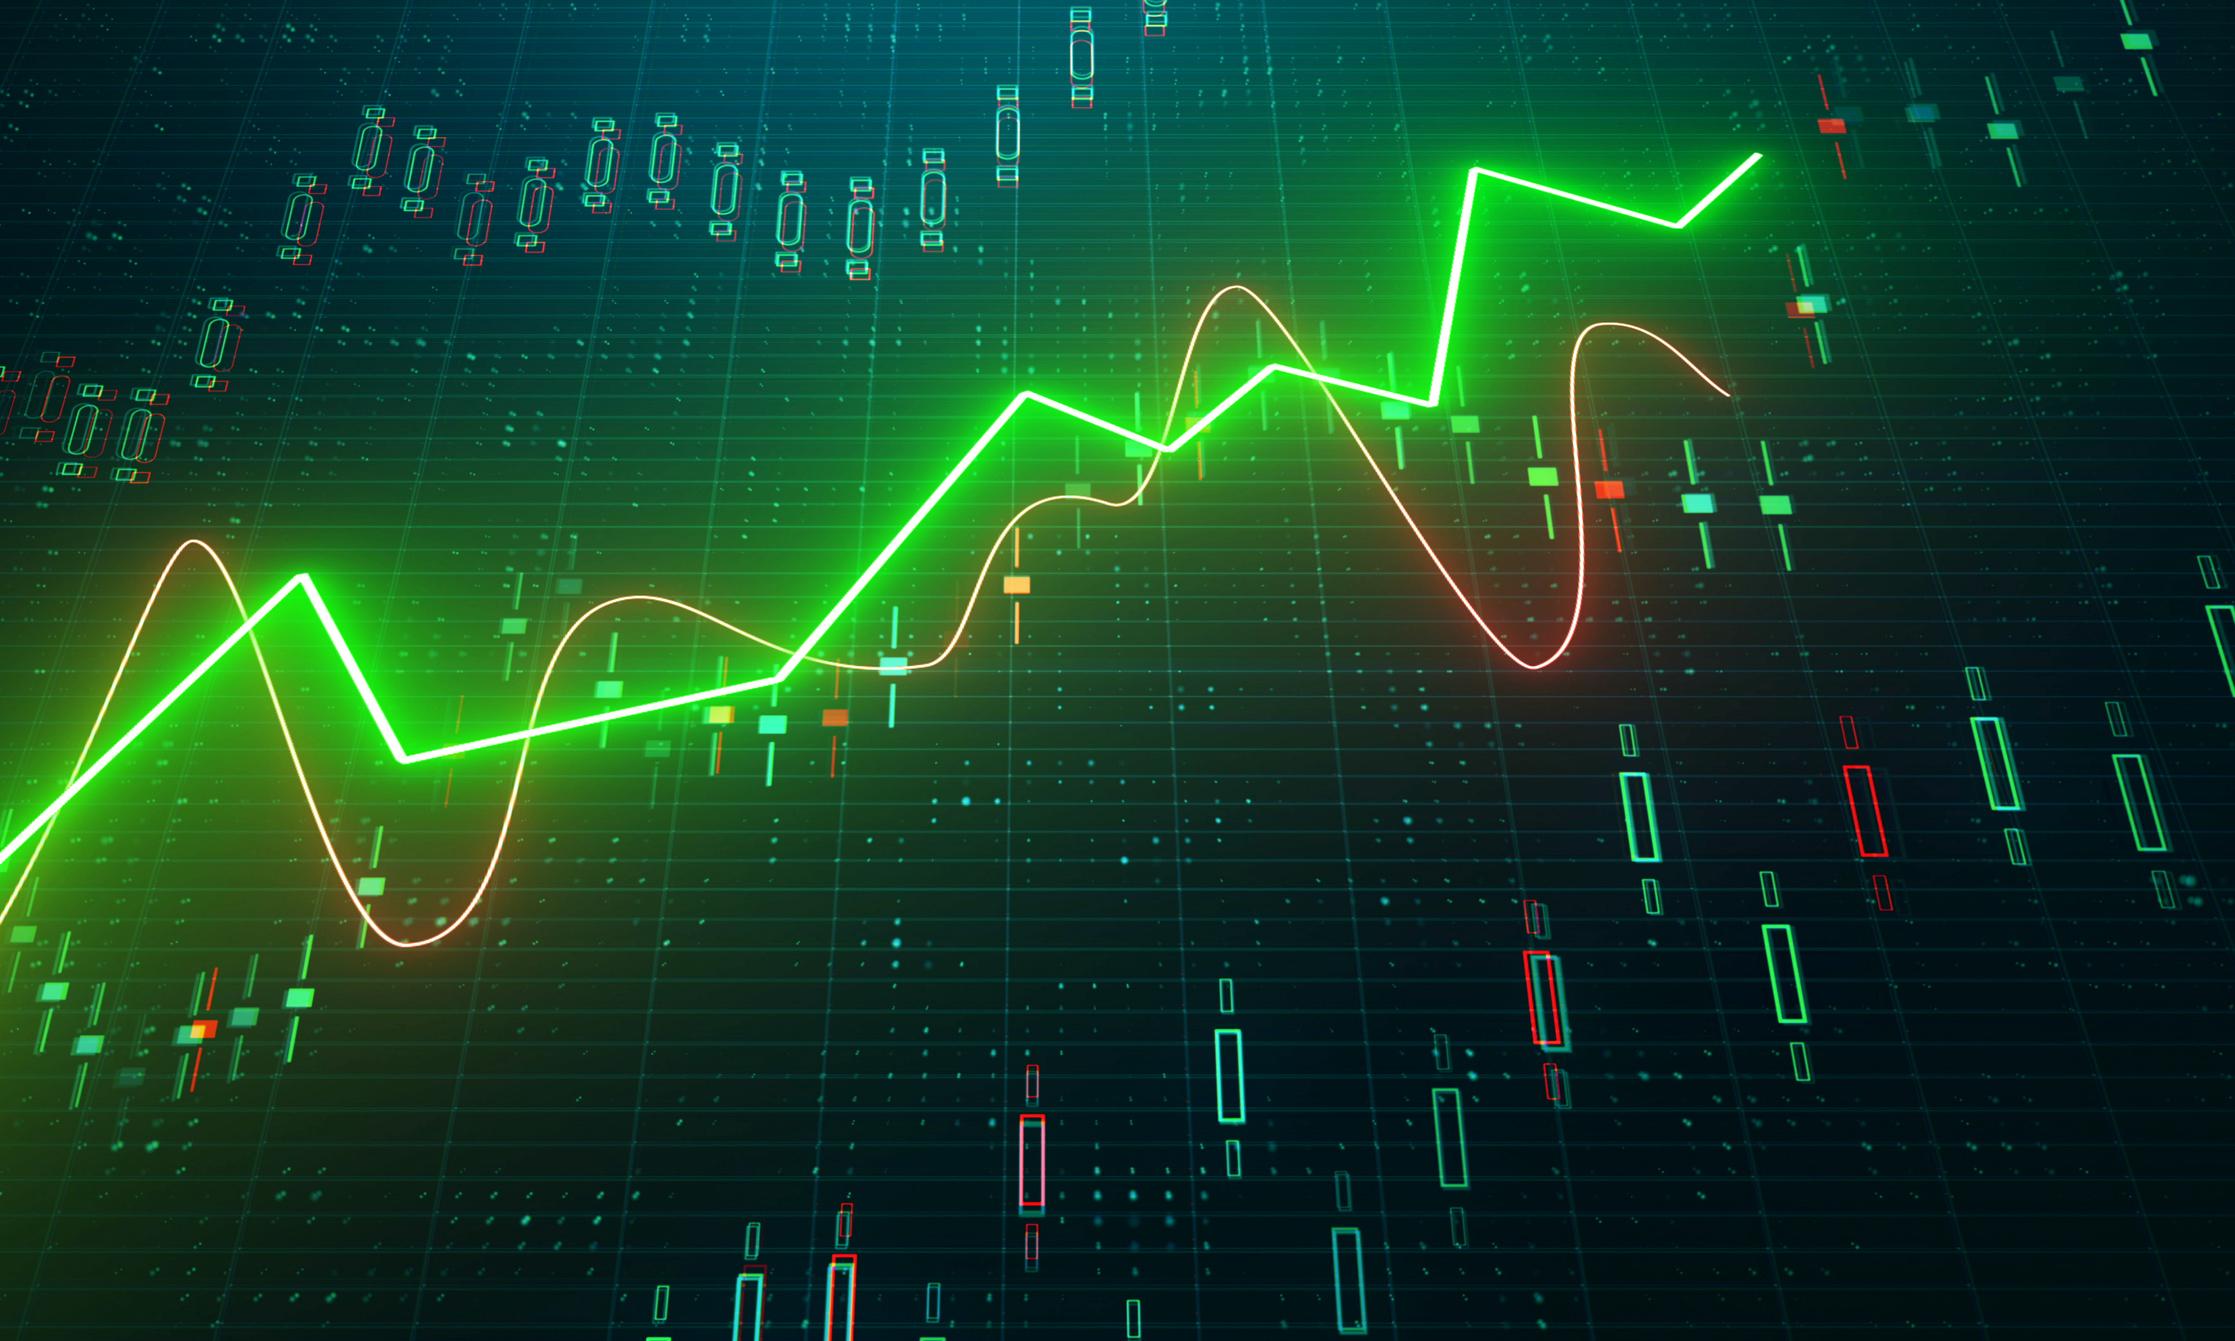 Why Tesla Stock Popped Again Tuesday @themotleyfool #stocks $TSLA $AMZN $CCIV